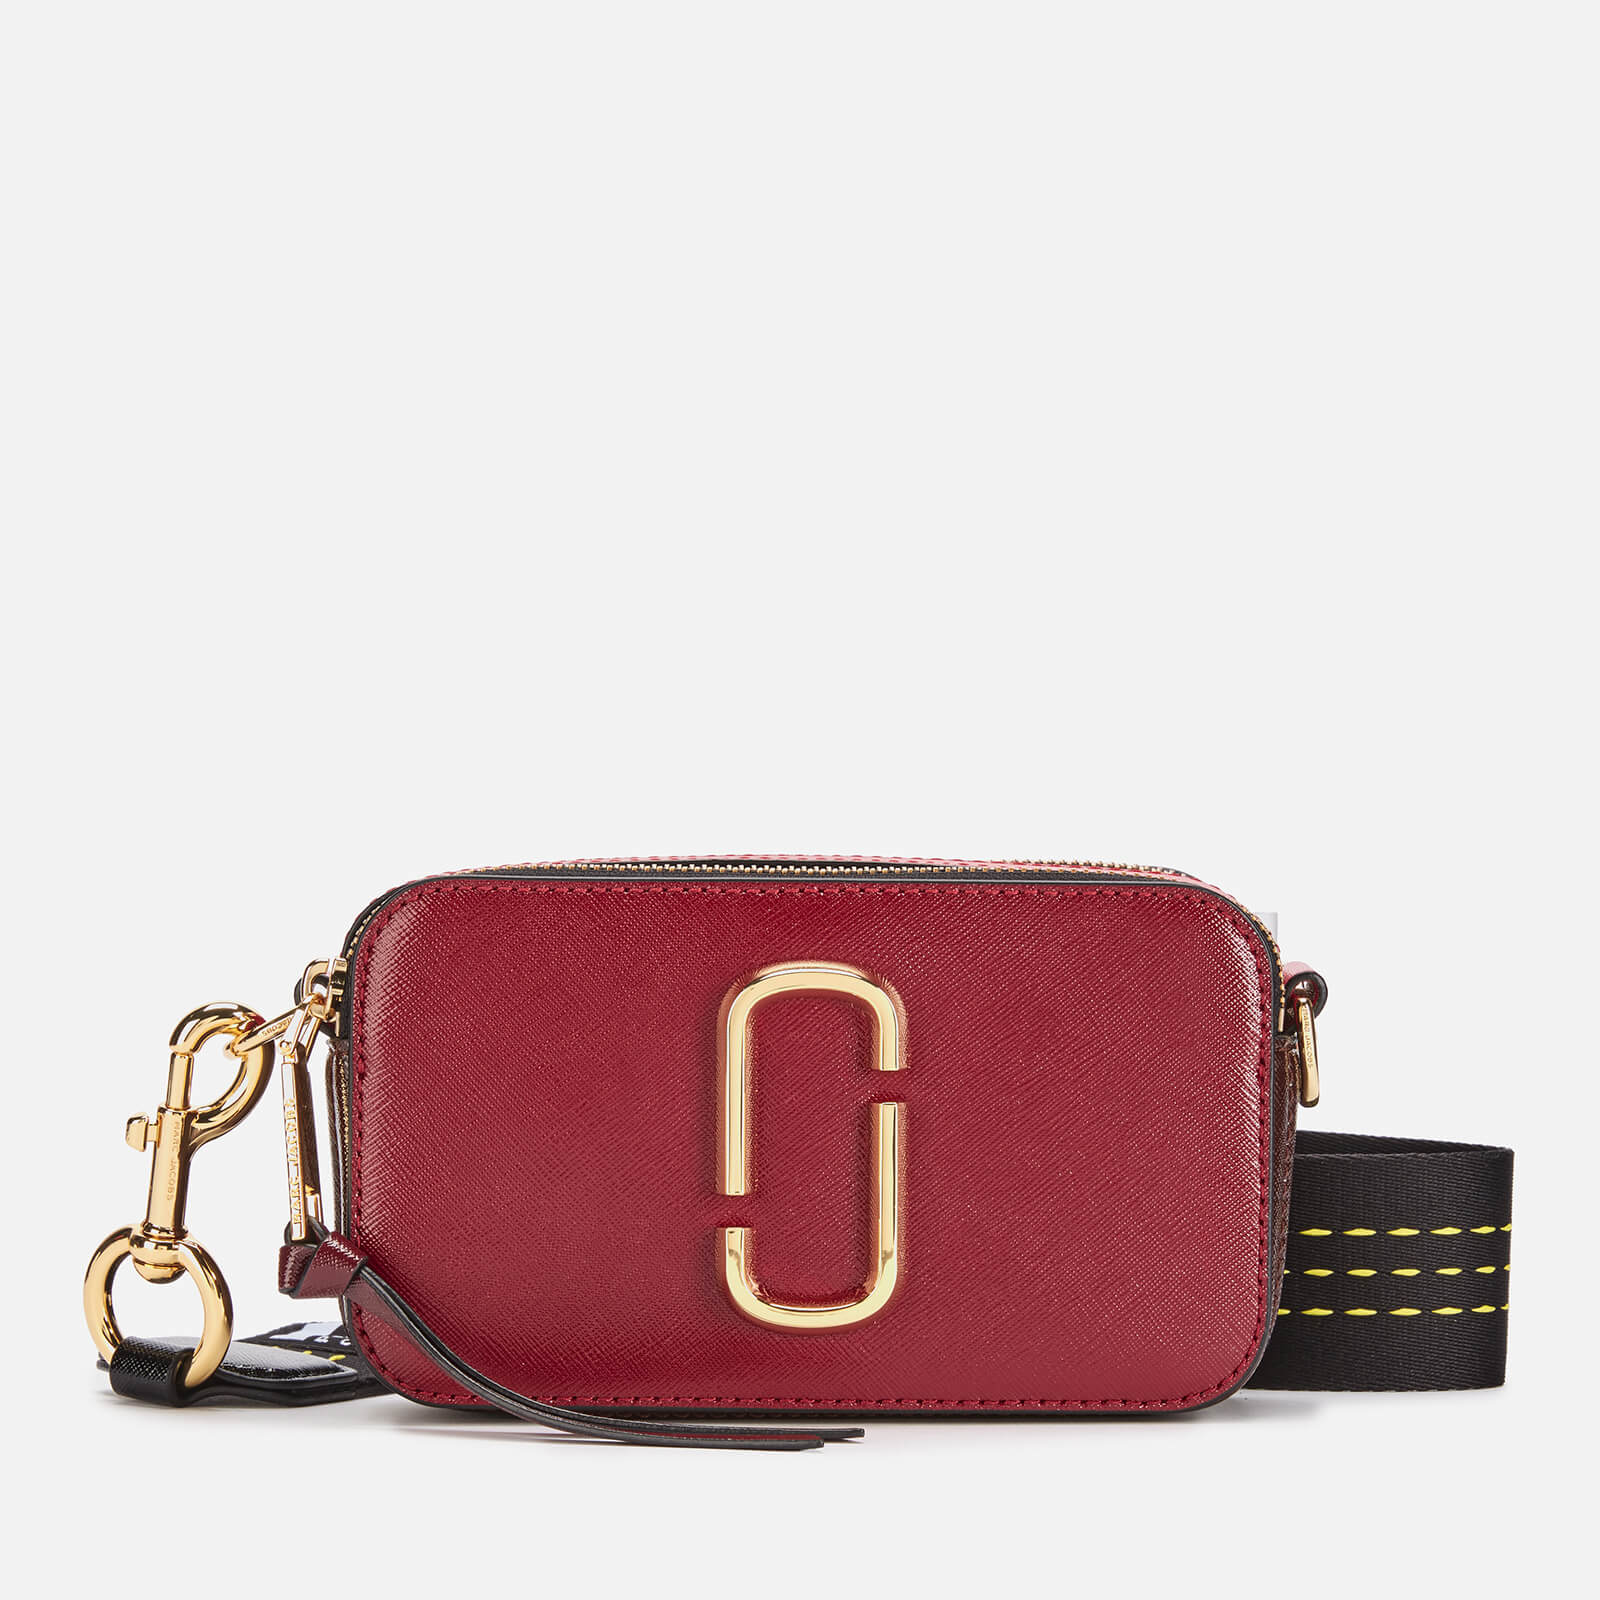 Marc Jacobs Women's Snapshot Bag - Cranberry/Multi